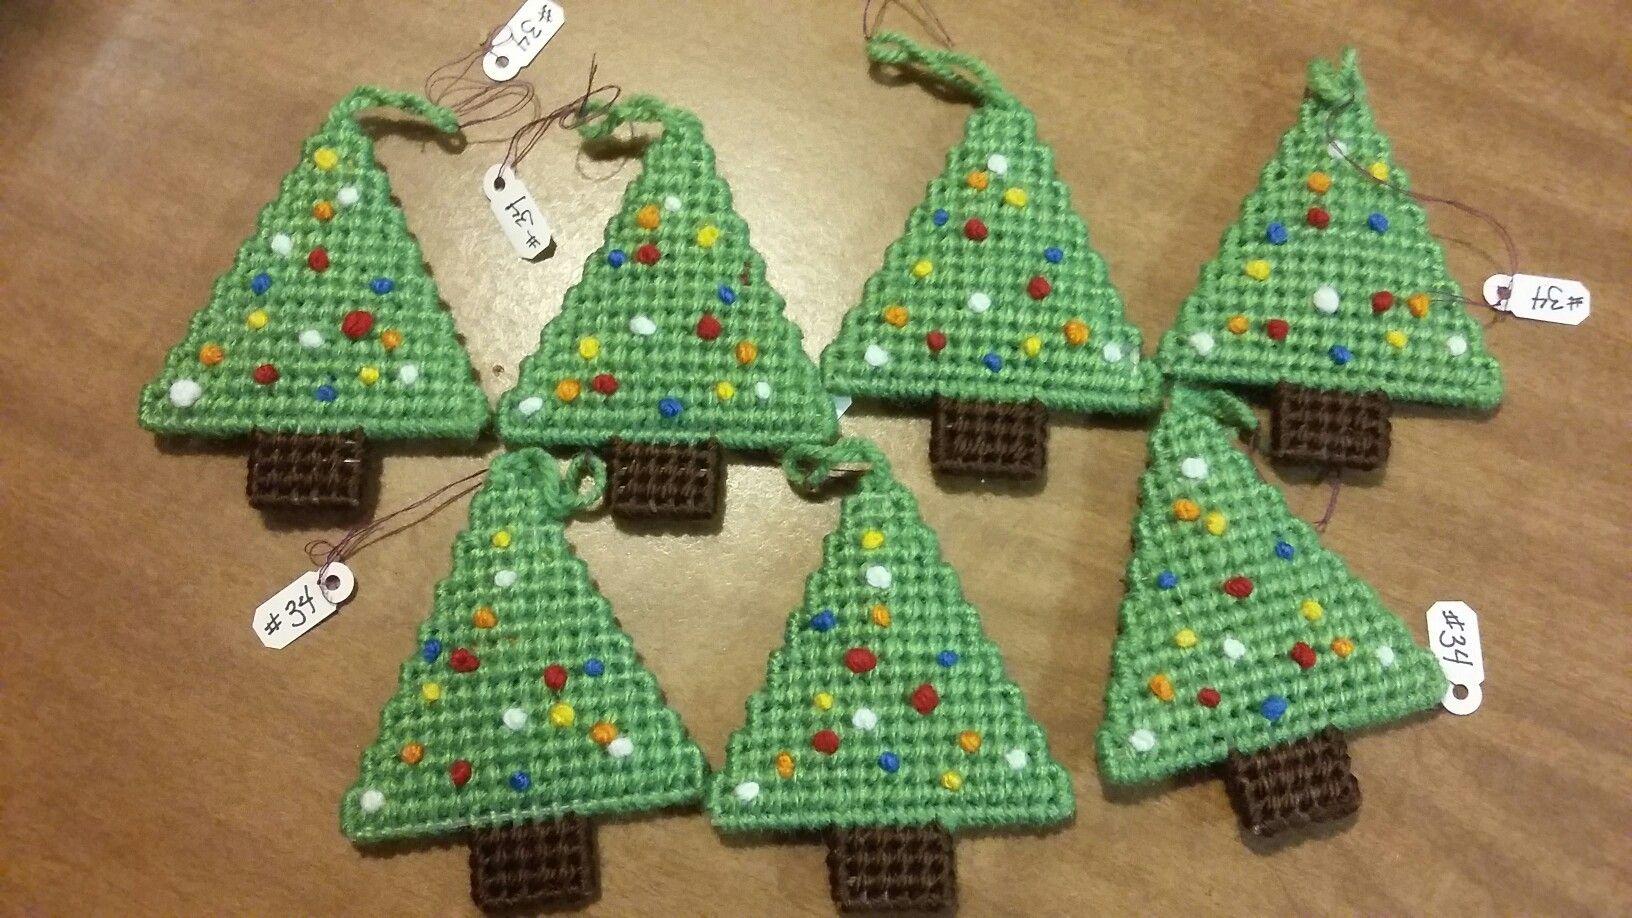 Plastic Canvas Christmas Ornaments.Plastic Canvas Christmas Tree Ornaments Things I Ve Made